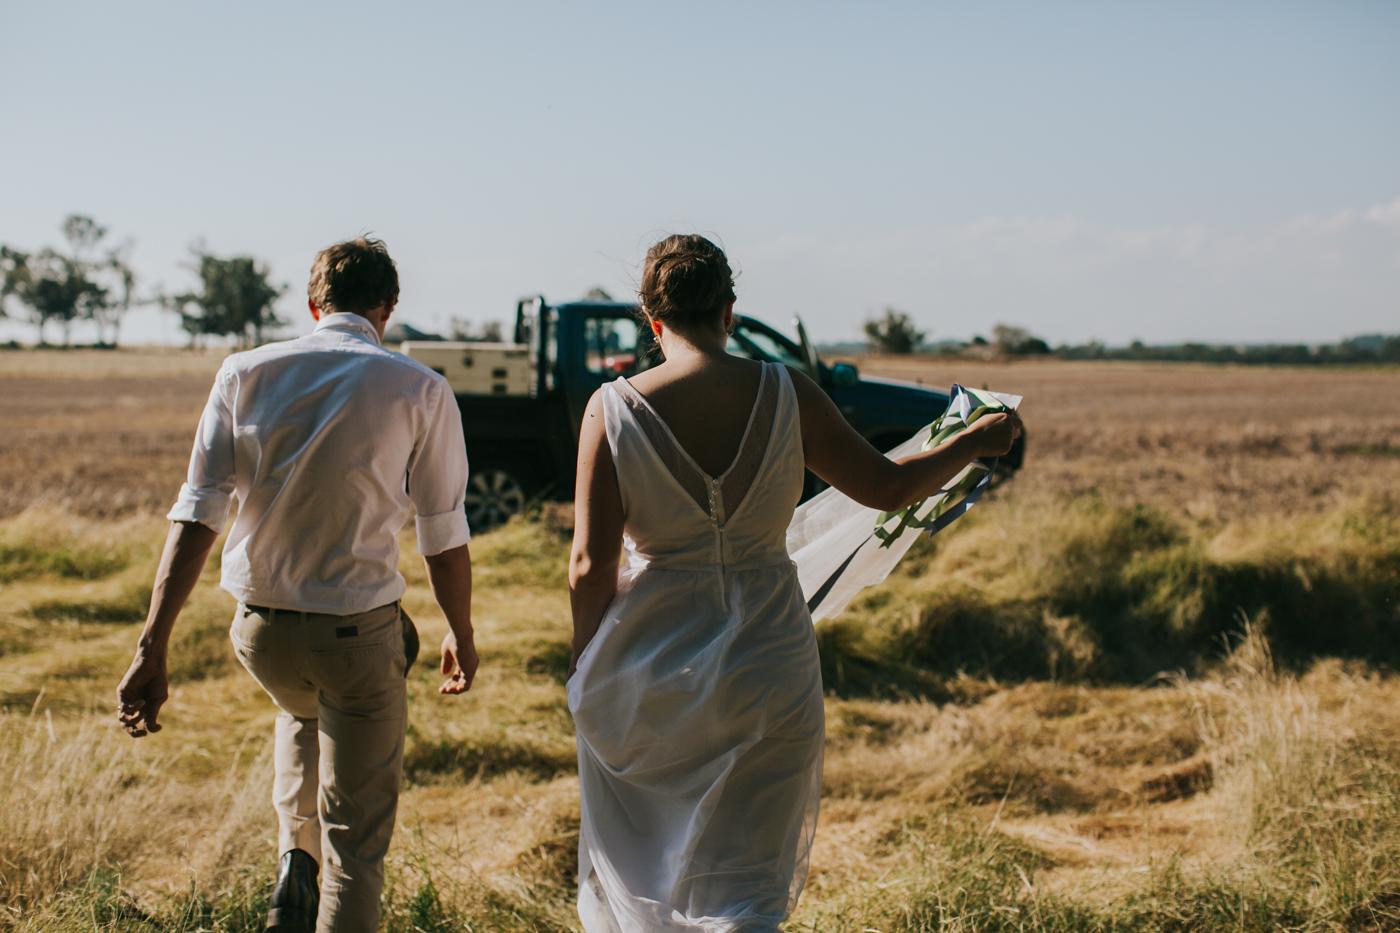 Nicolle & Jacob - Dubbo Wedding - Country Australia - Samantha Heather Photography-188.jpg